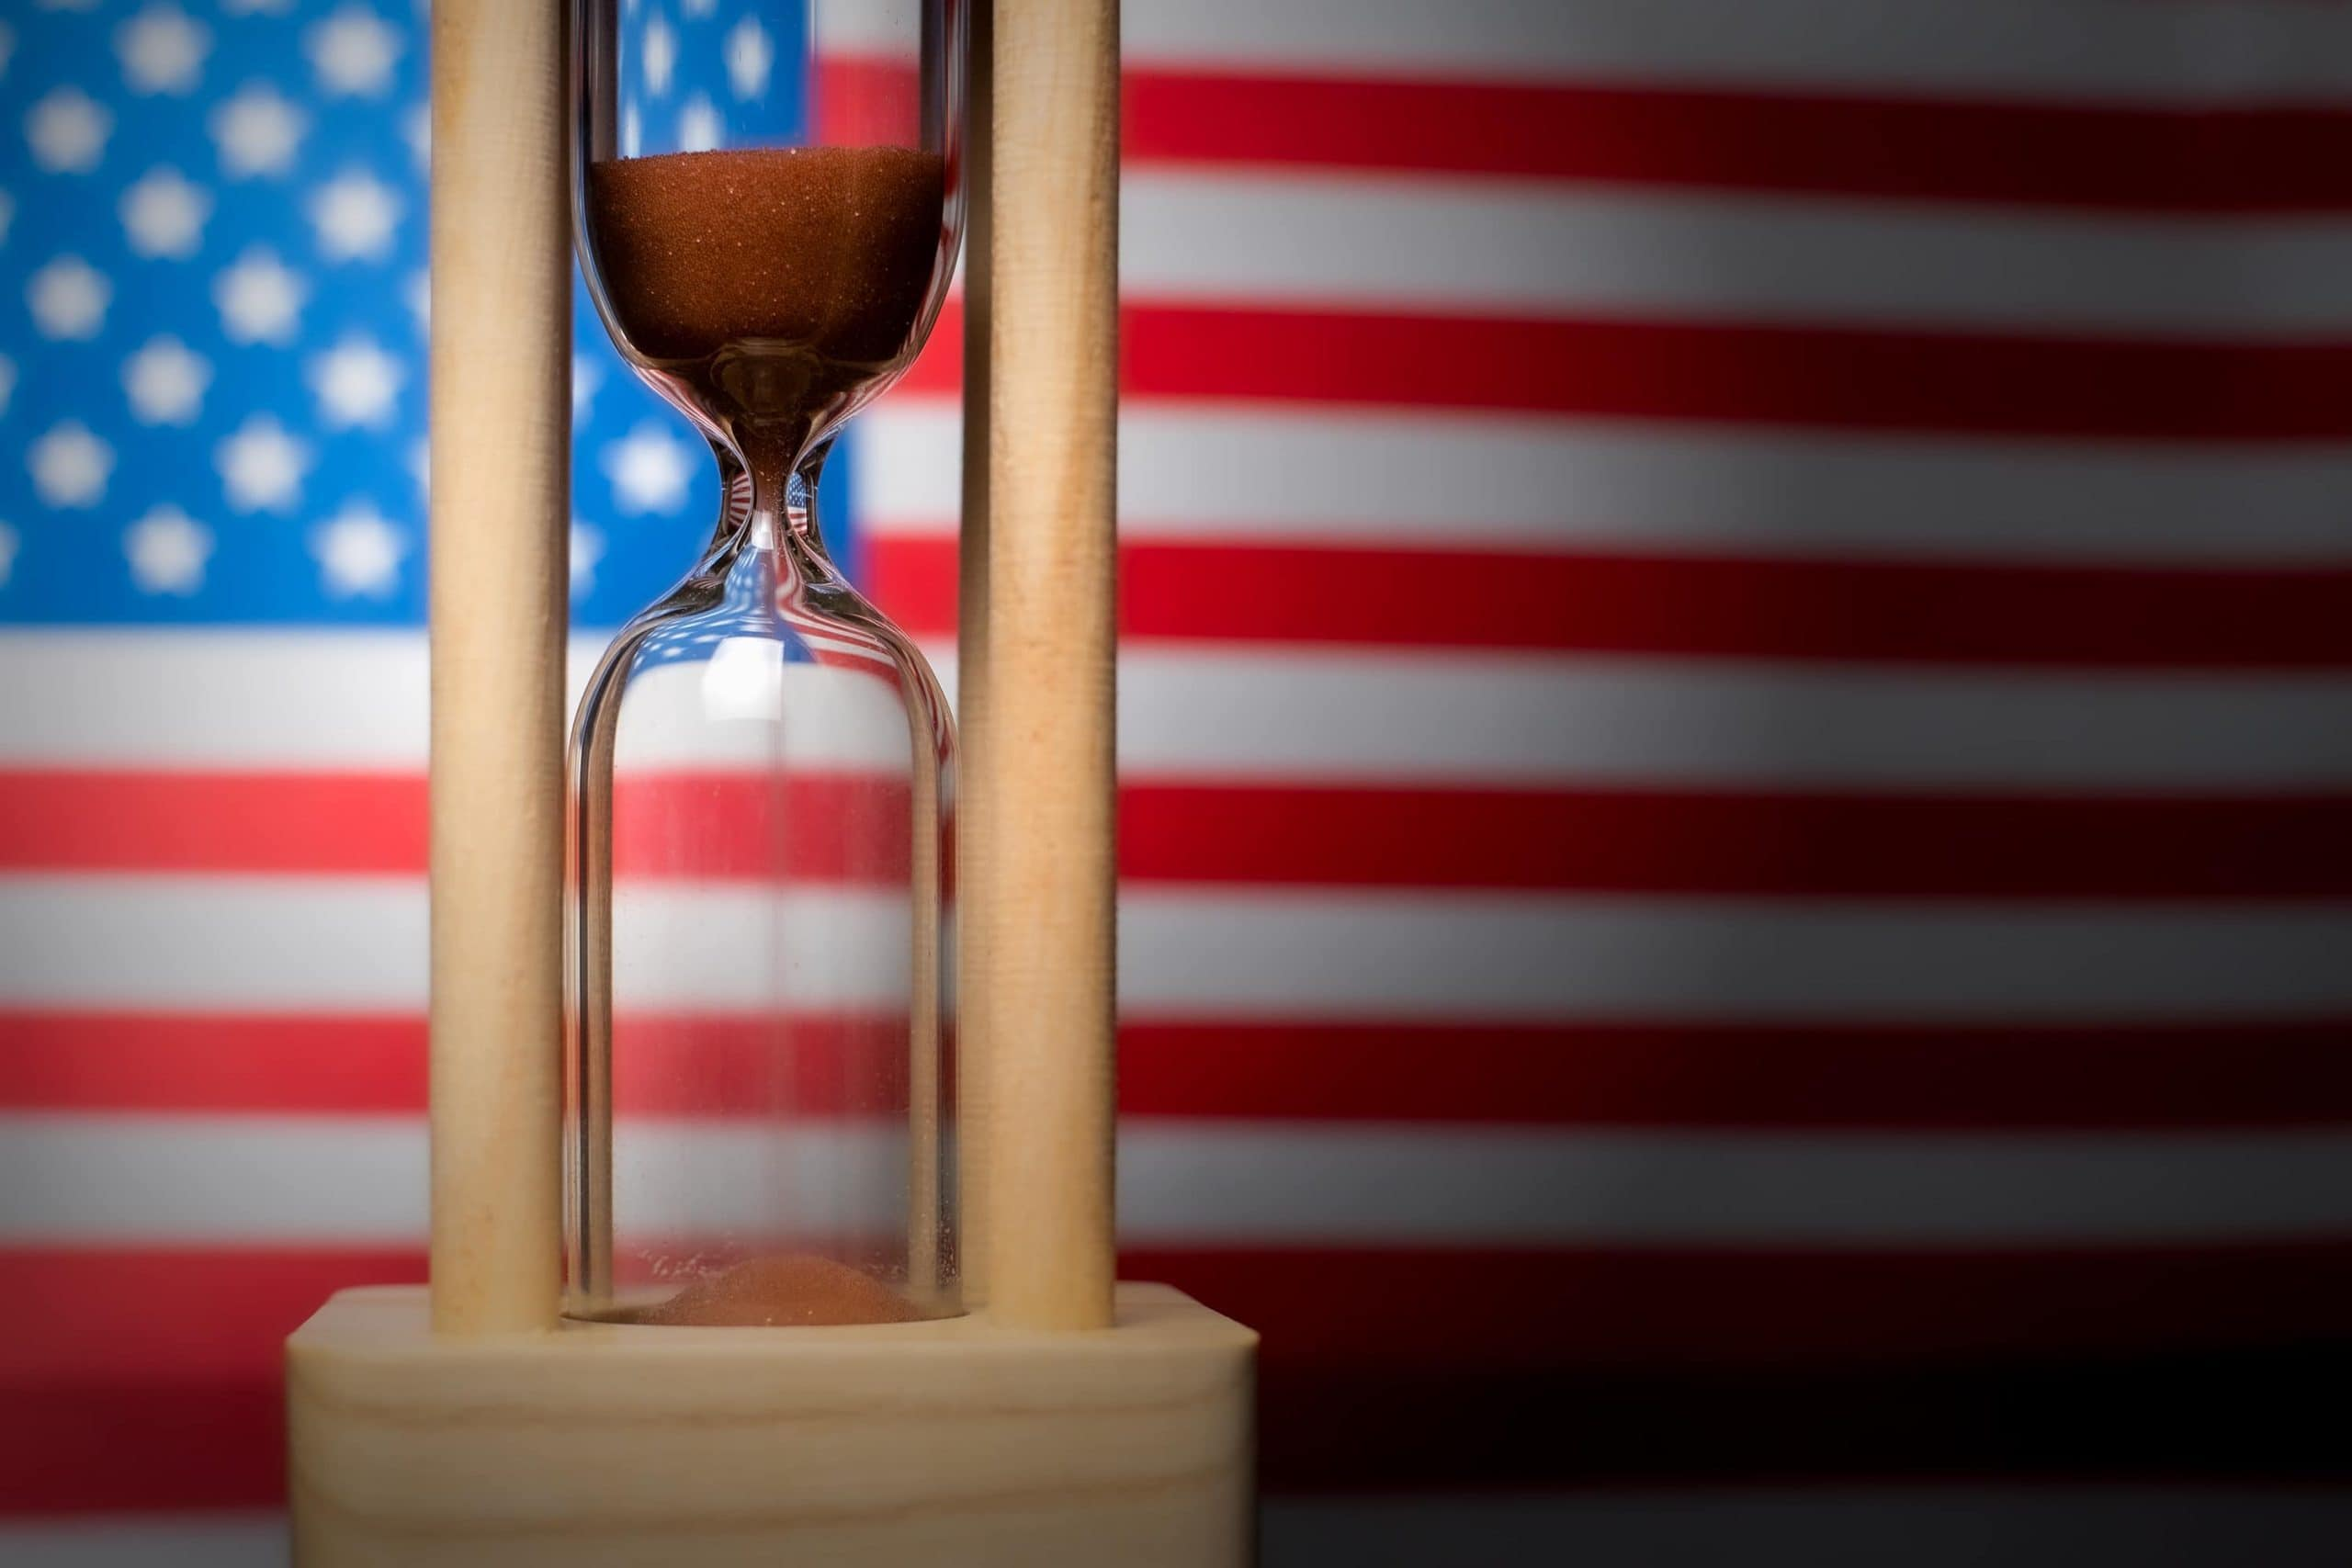 Sanduhr vor USA-Flagge